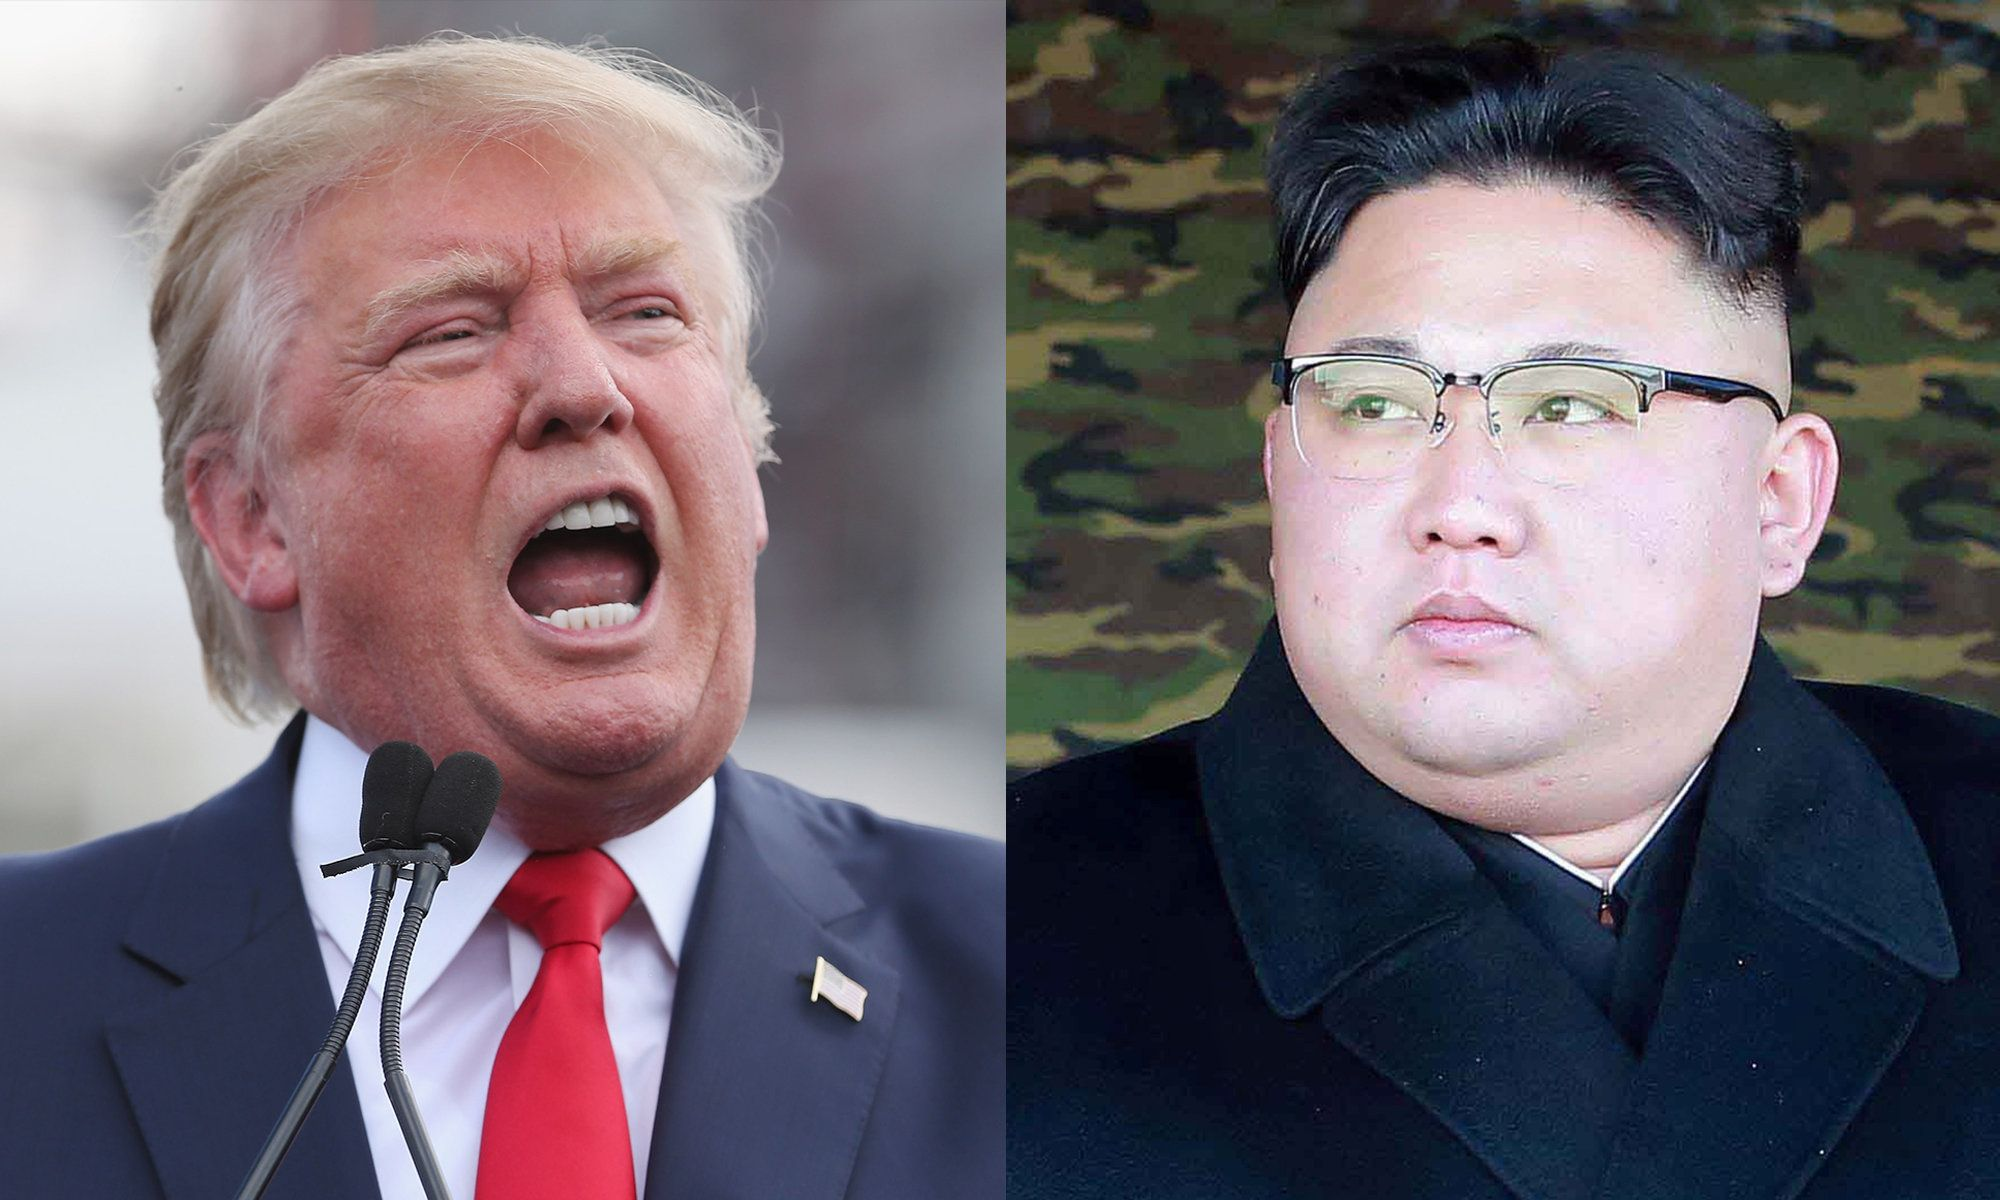 US President Donald Trump and North Koreas leader Kim Jong-un